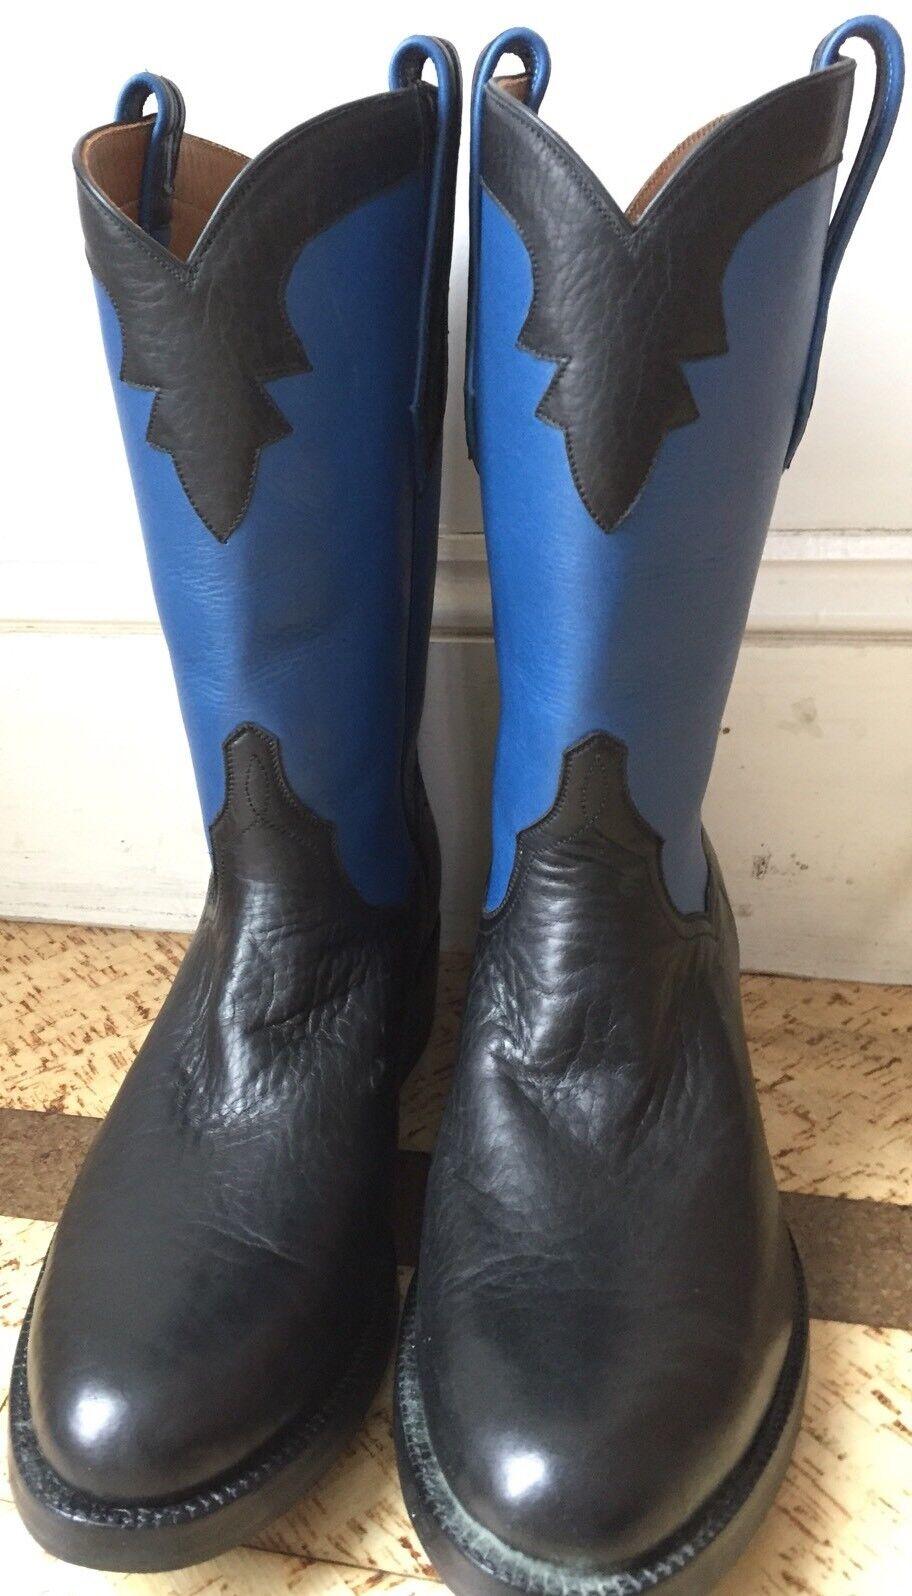 JB Hill Stiefel Texas schwarz Bison Blau Calfskin Cowboy Western Western Western Stiefel 9D Roper 3aa13d